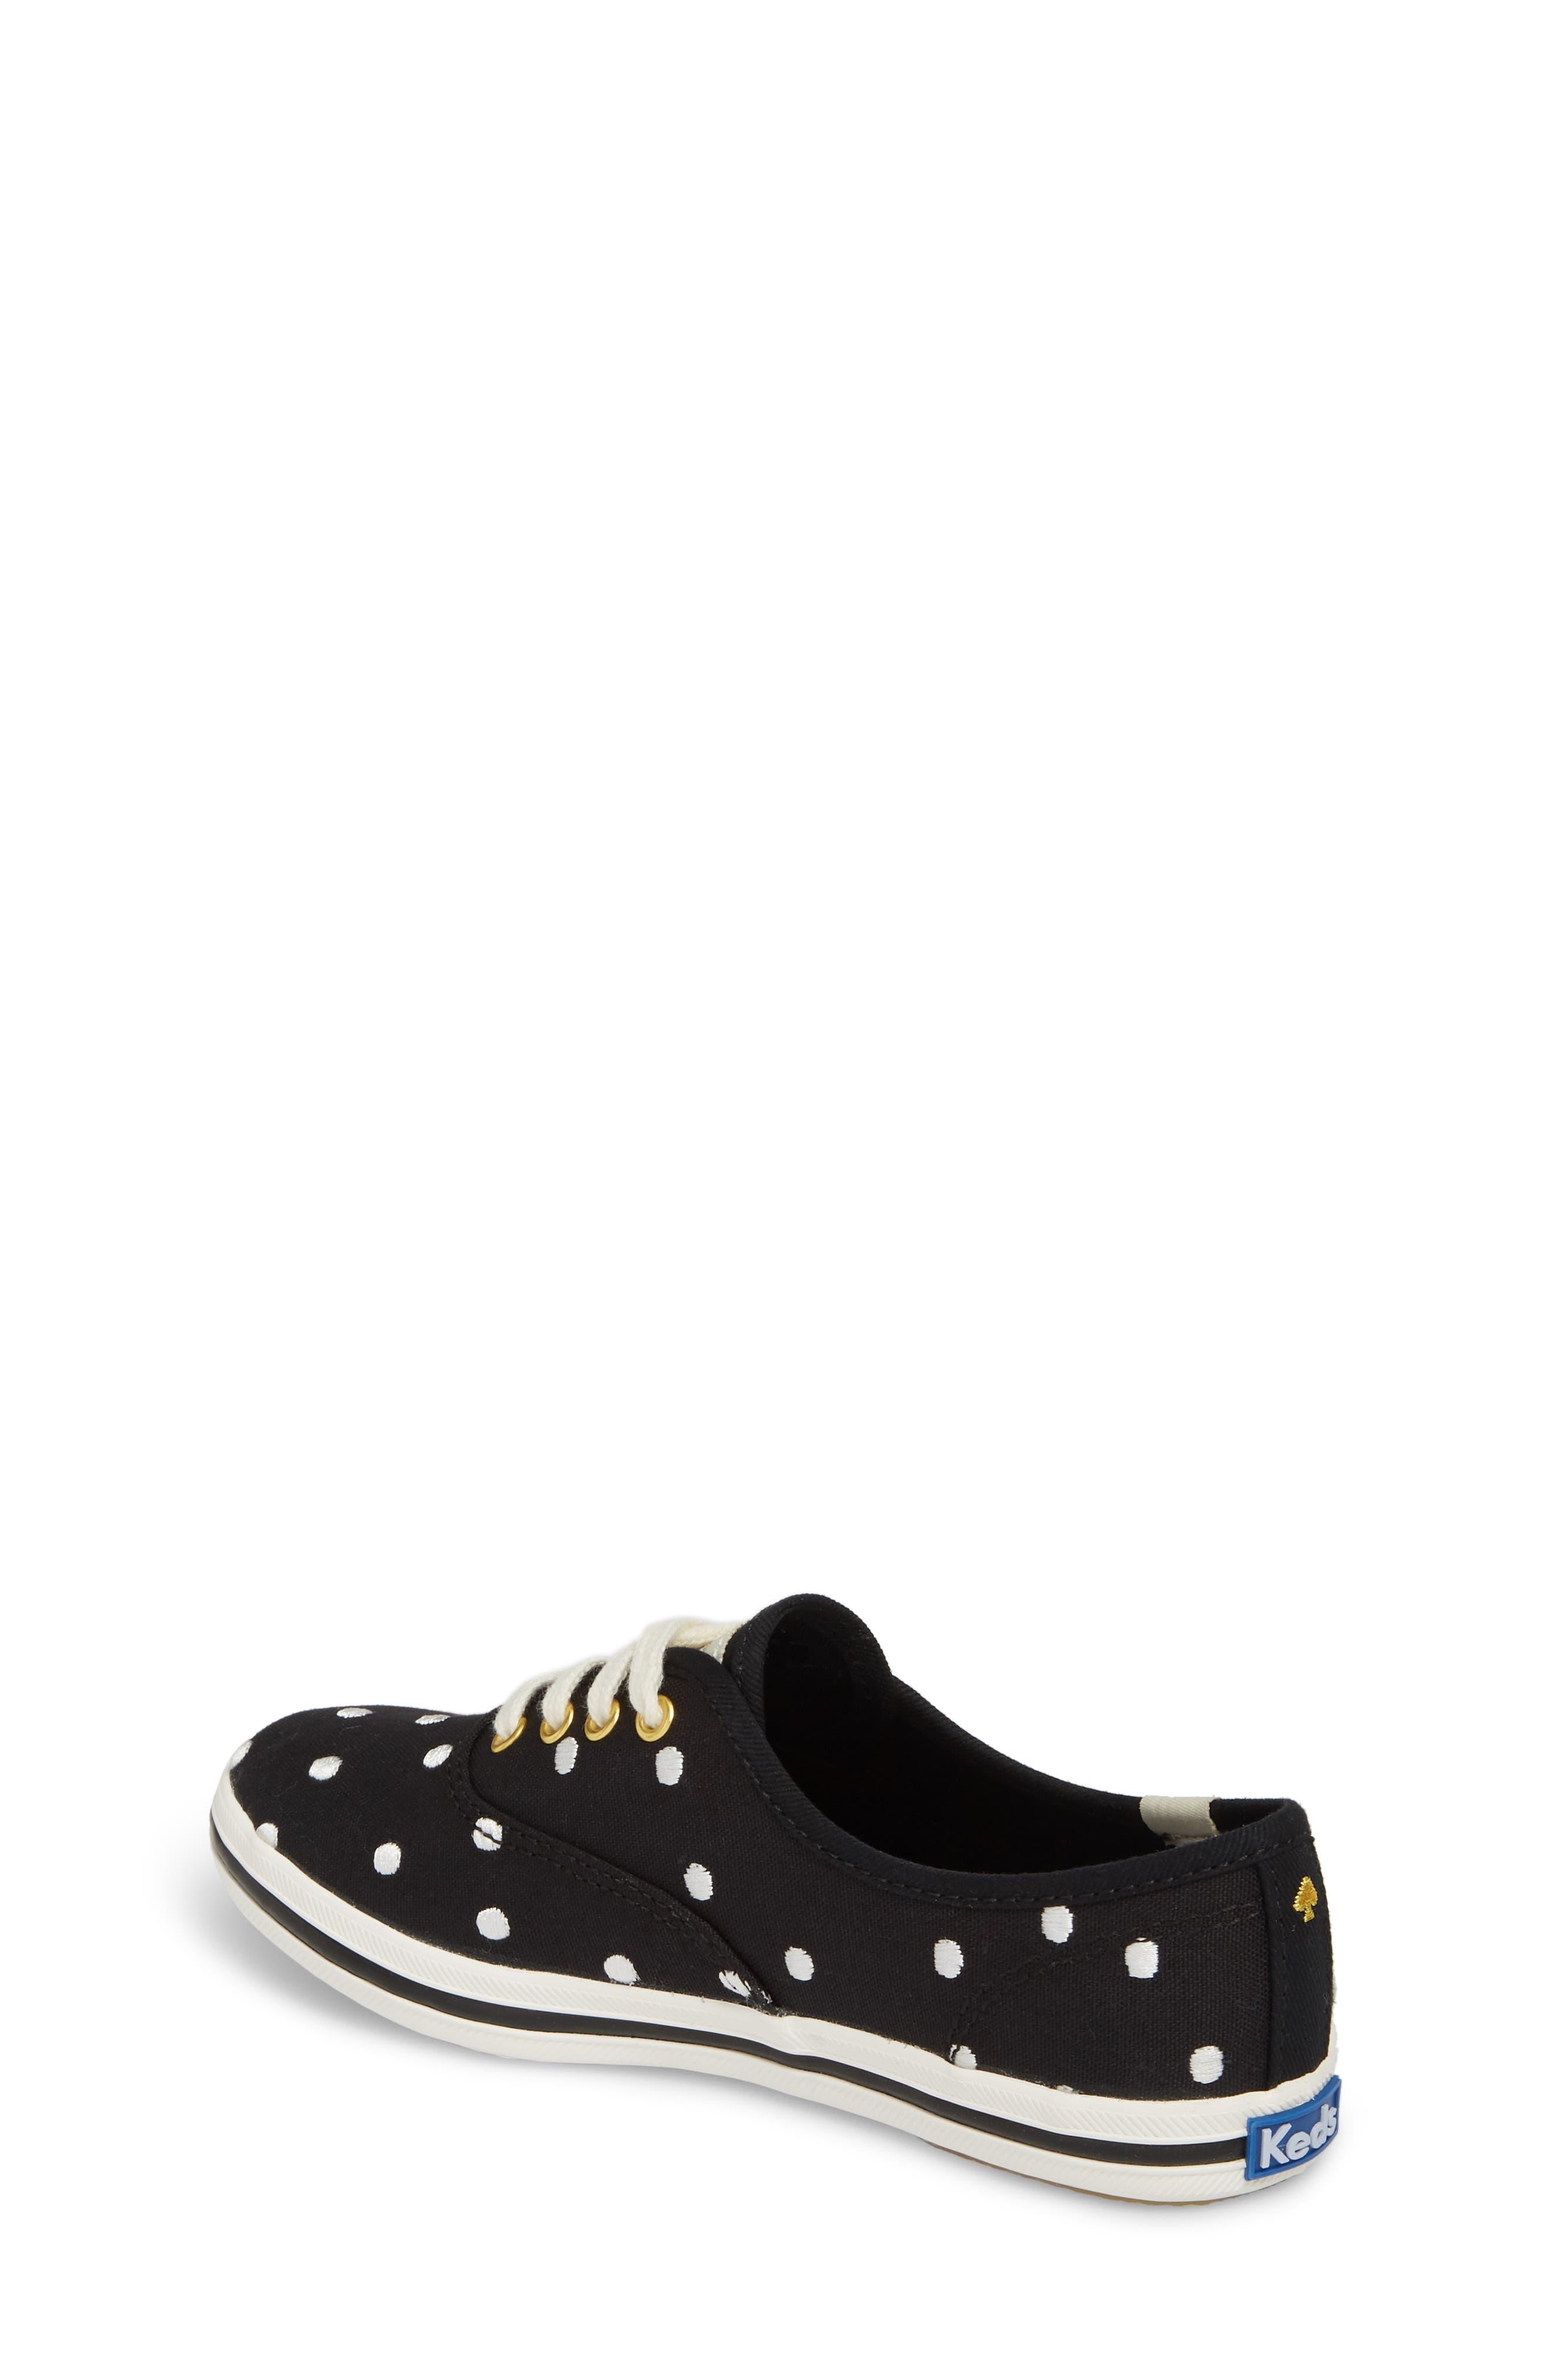 x kate spade new york champion polka dot lace-up shoe,                             Alternate thumbnail 2, color,                             BLACK DANCING DOT